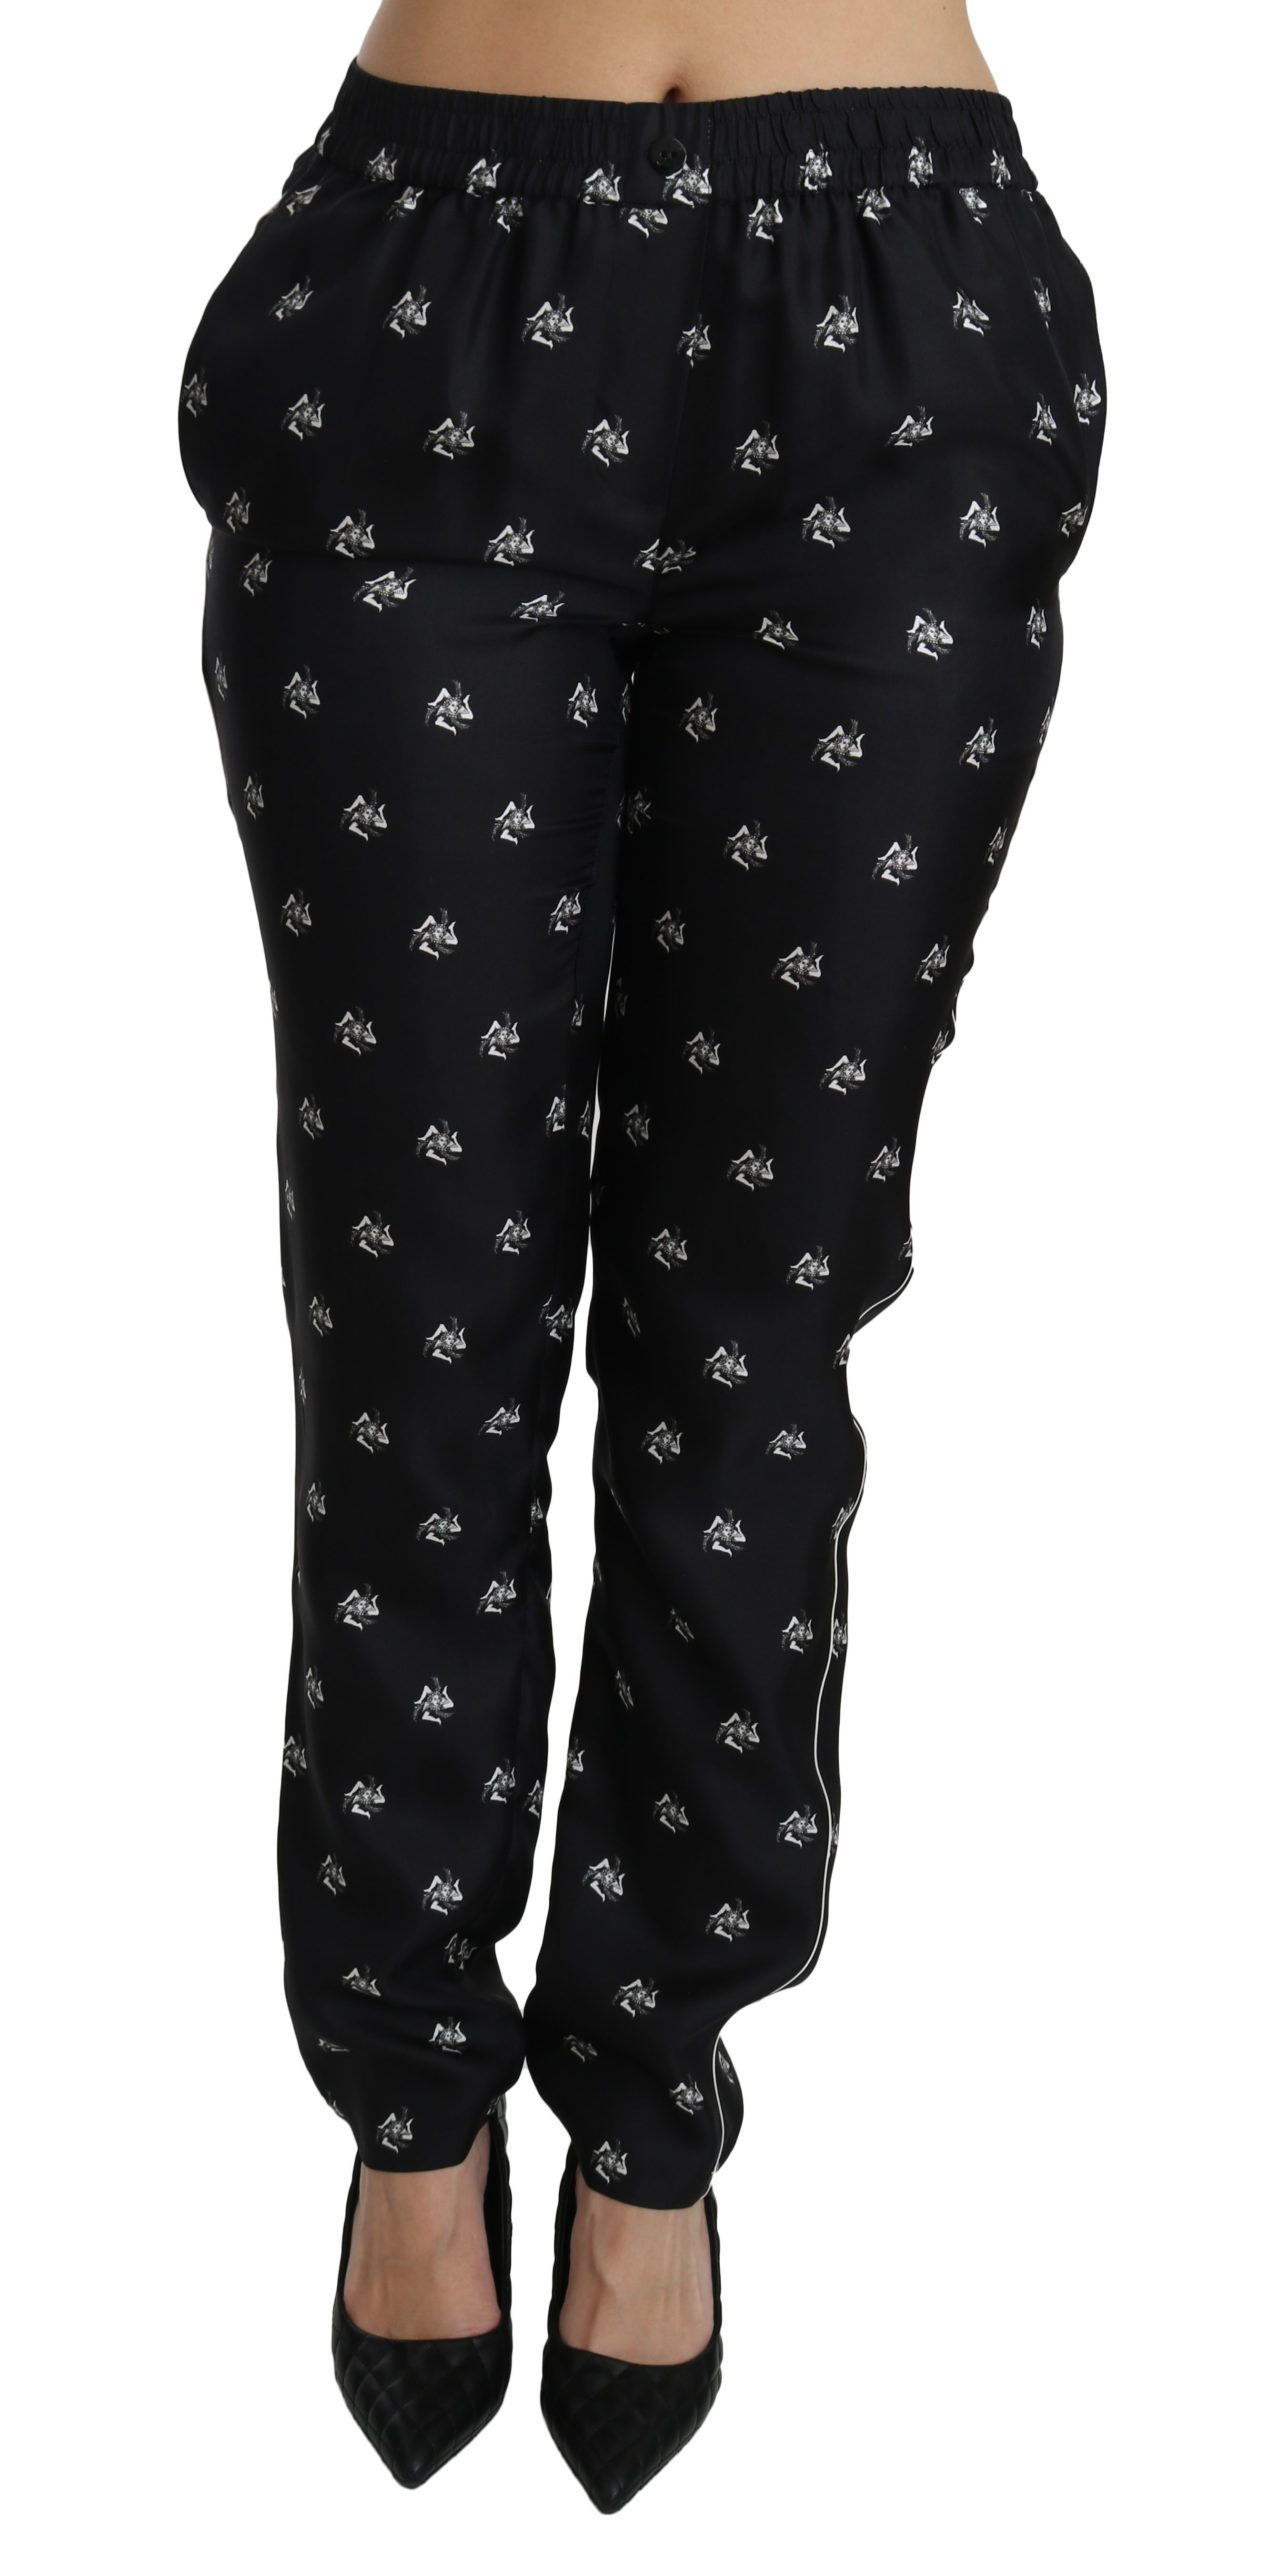 Dolce & Gabbana Women's Printed Mid Waist Skinny Silk Trouser Black PAN70866 - IT42 M